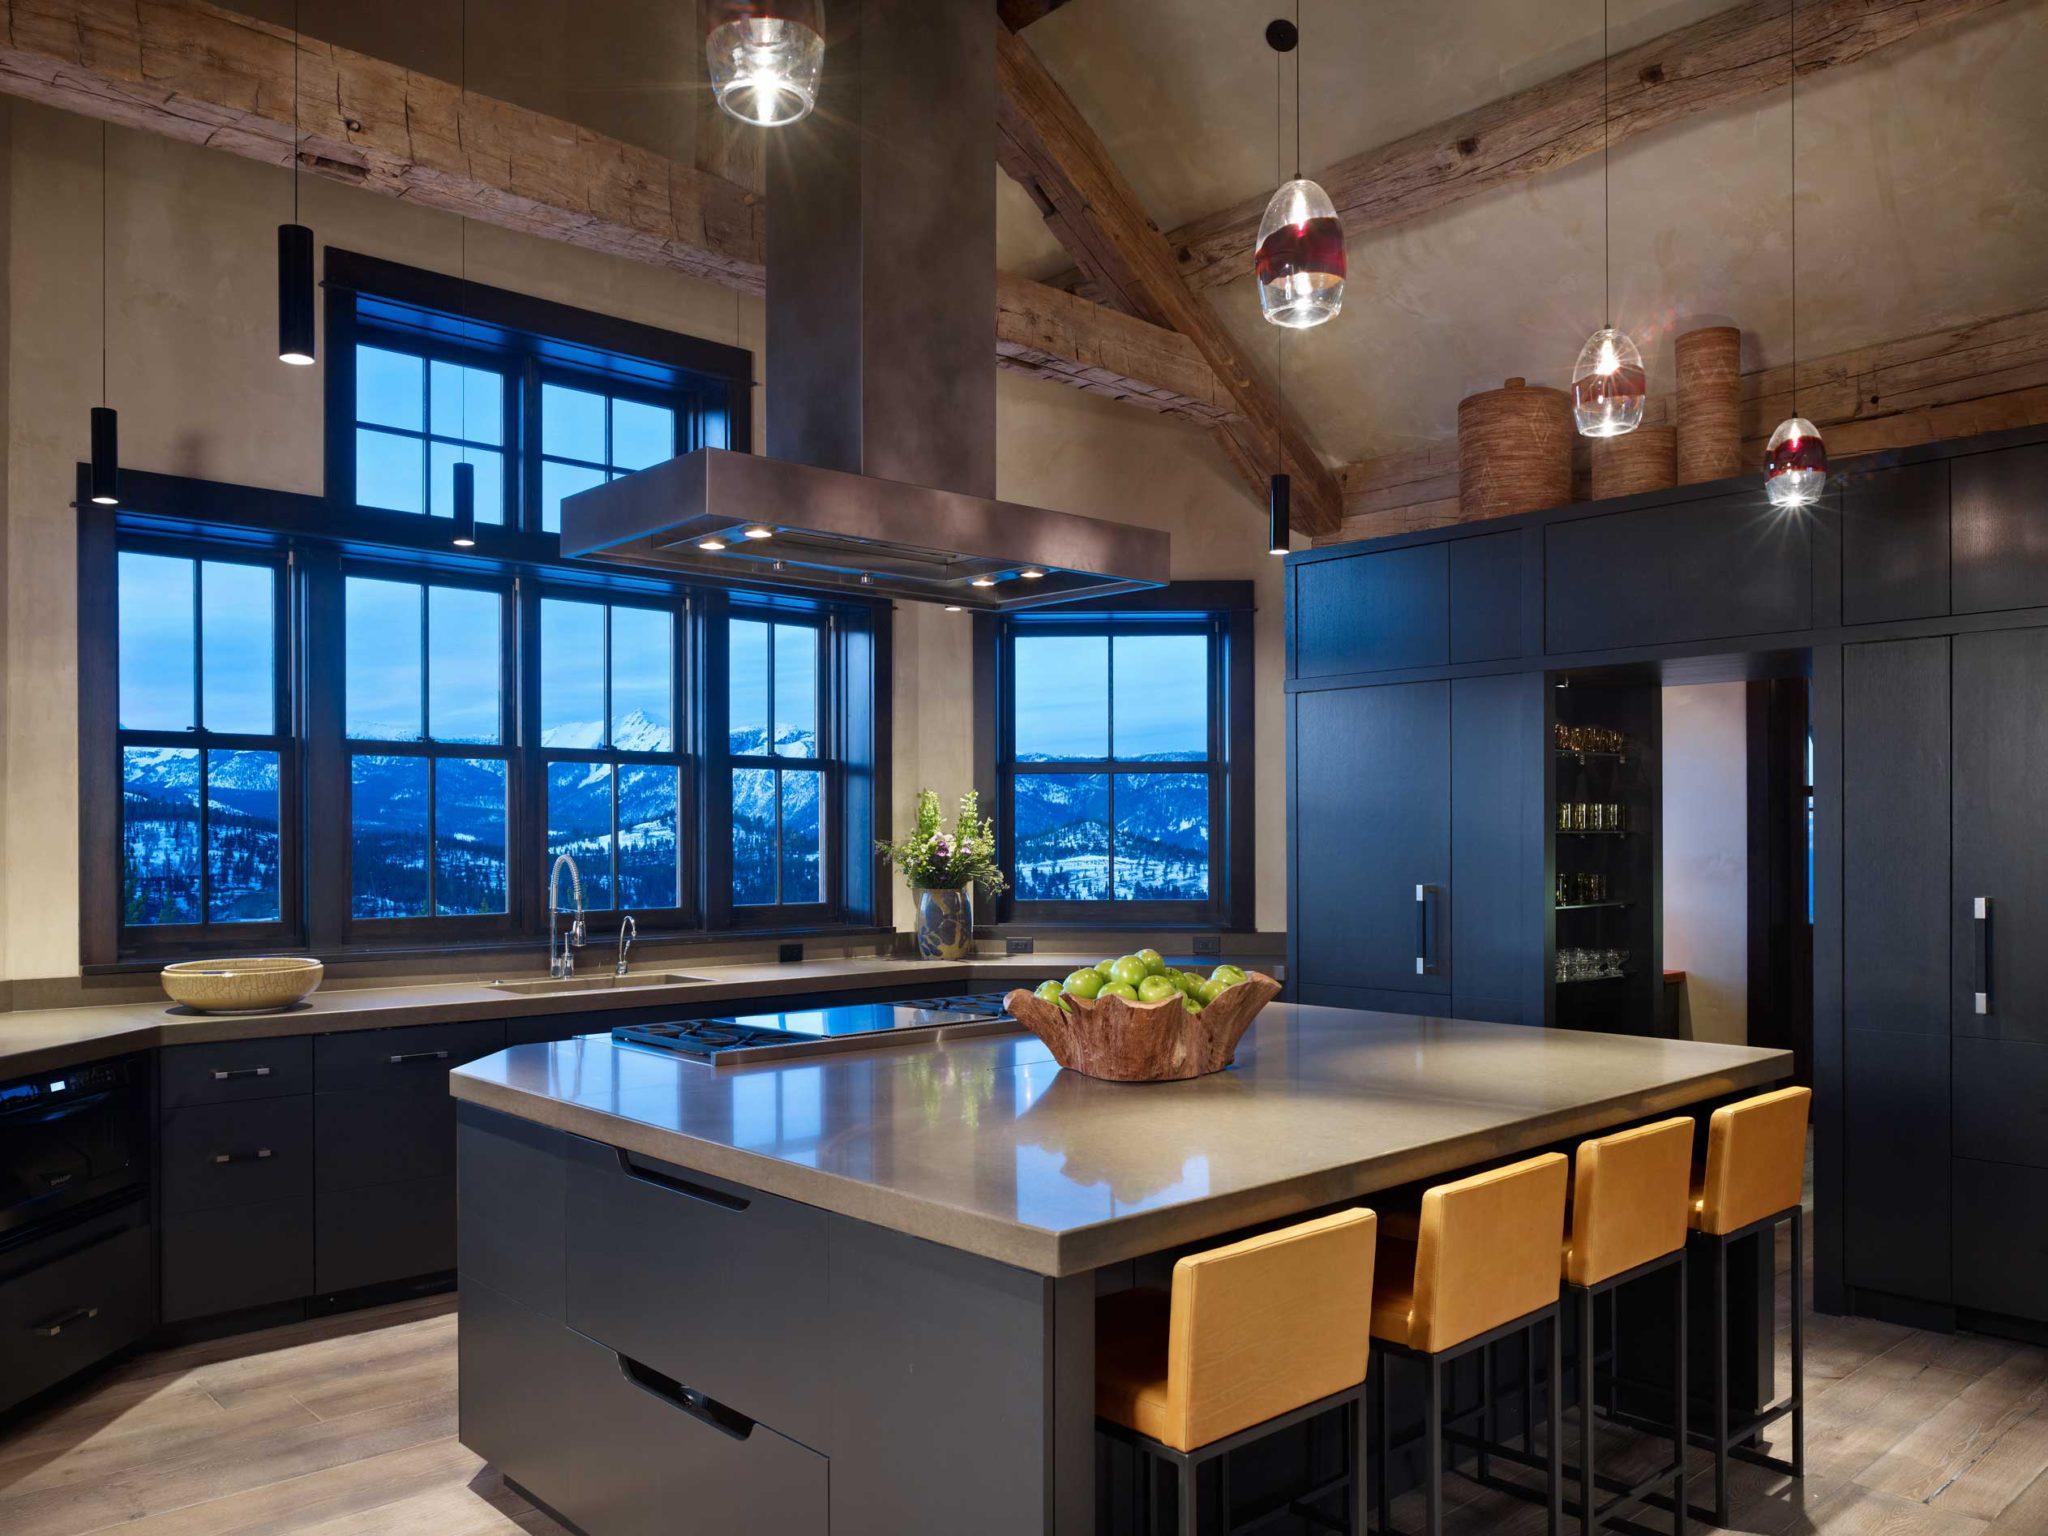 High Alpine Ranch Residence - Yellowstone Club, MT - Kitchen by LKID